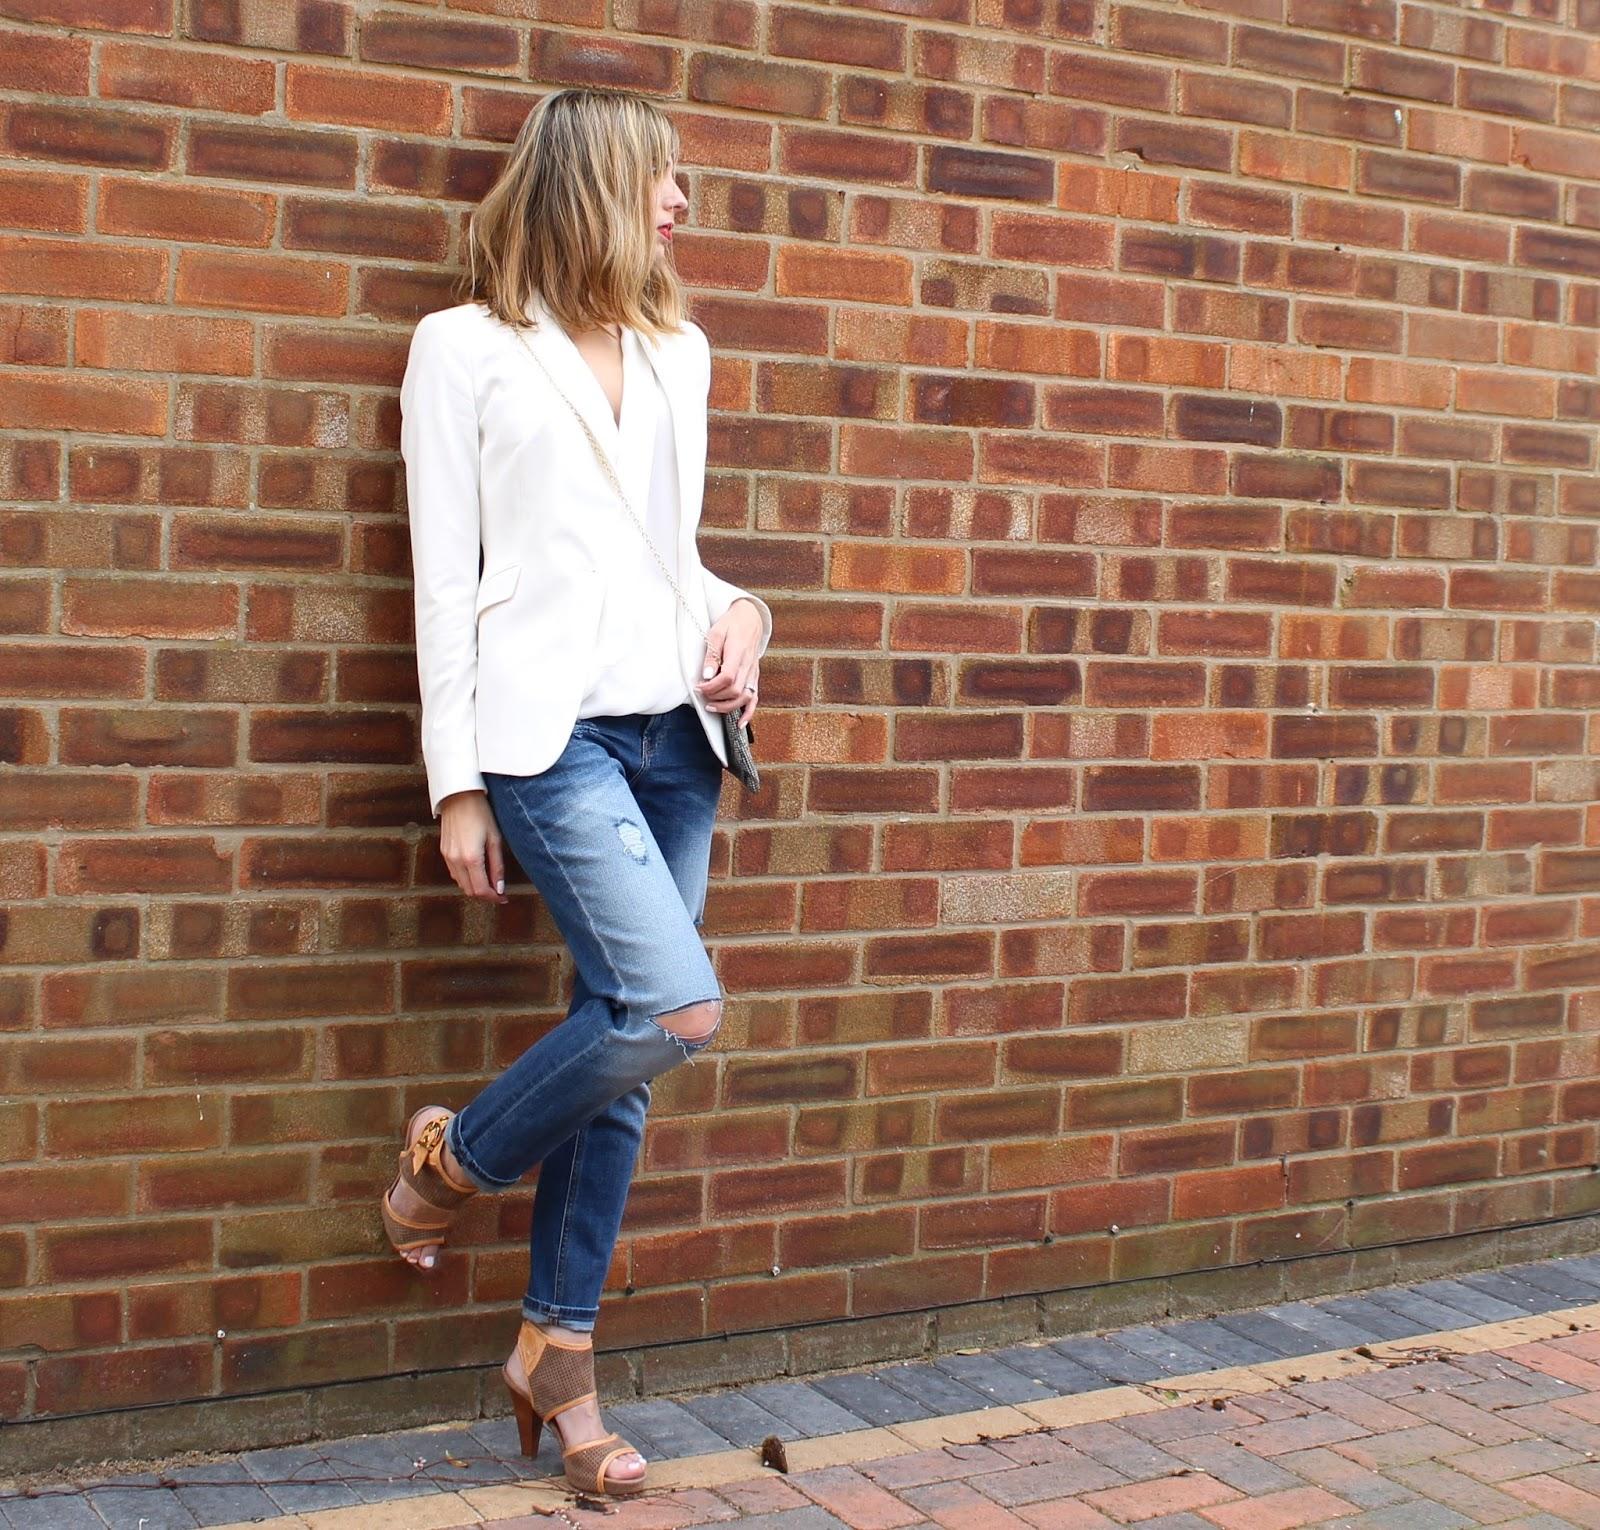 OOTD - H&M Girlfriend Jeans, Smart